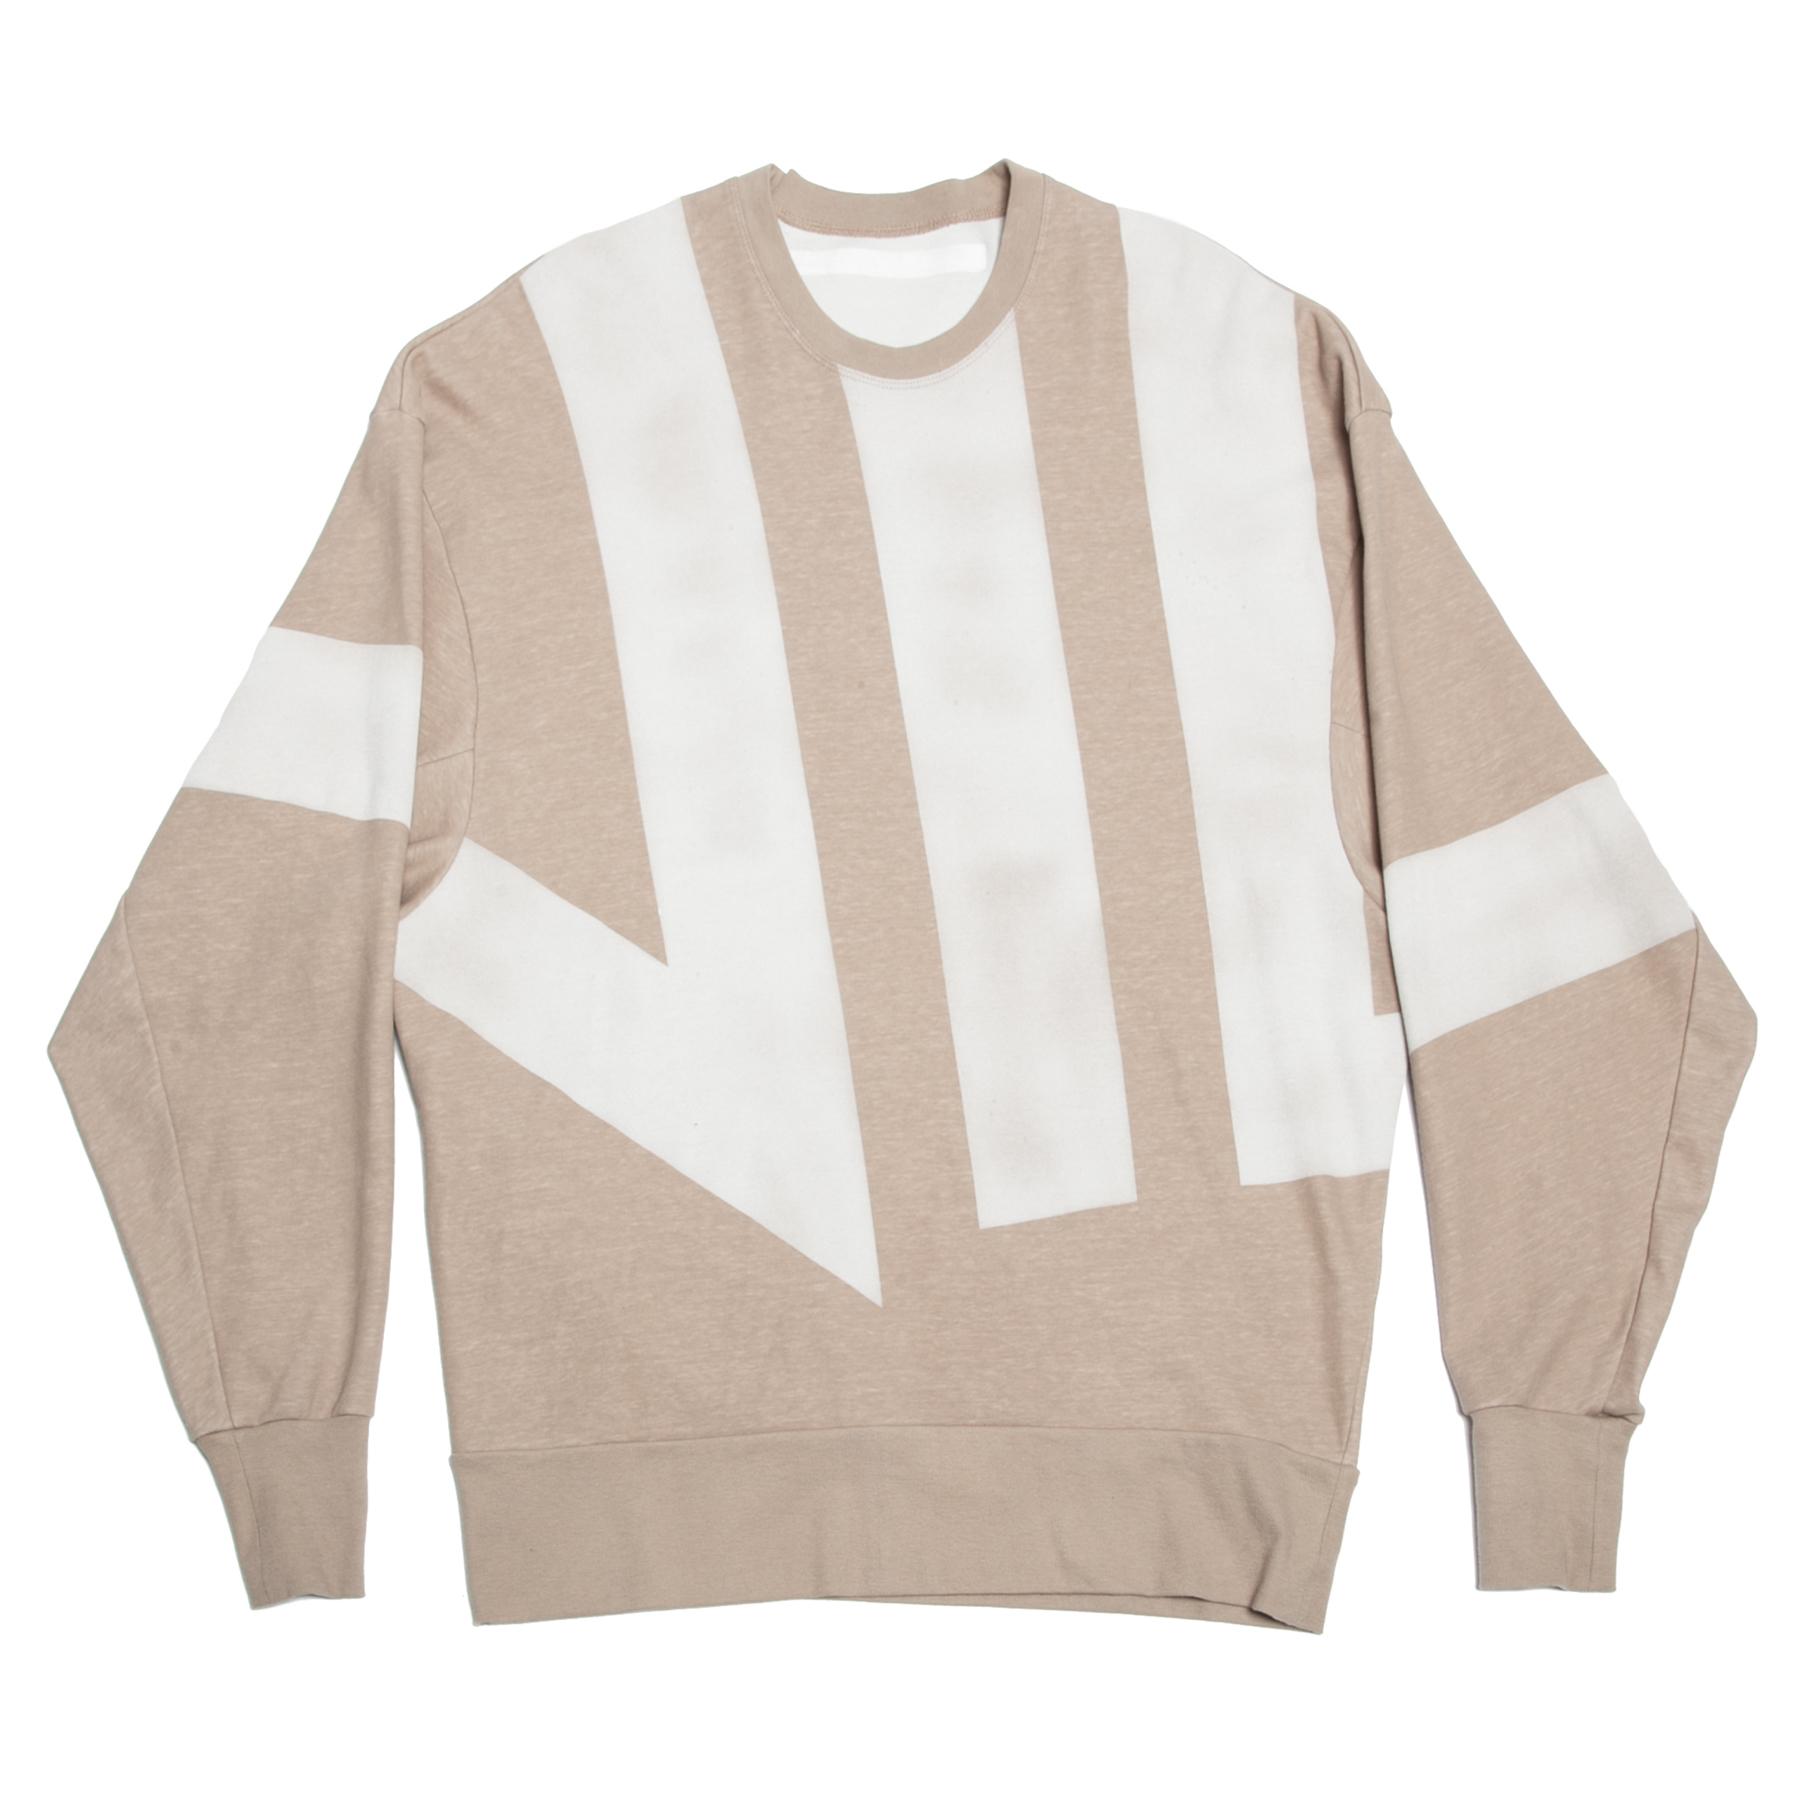 640CPM5-BEIGE / 家紋スウェットTシャツ